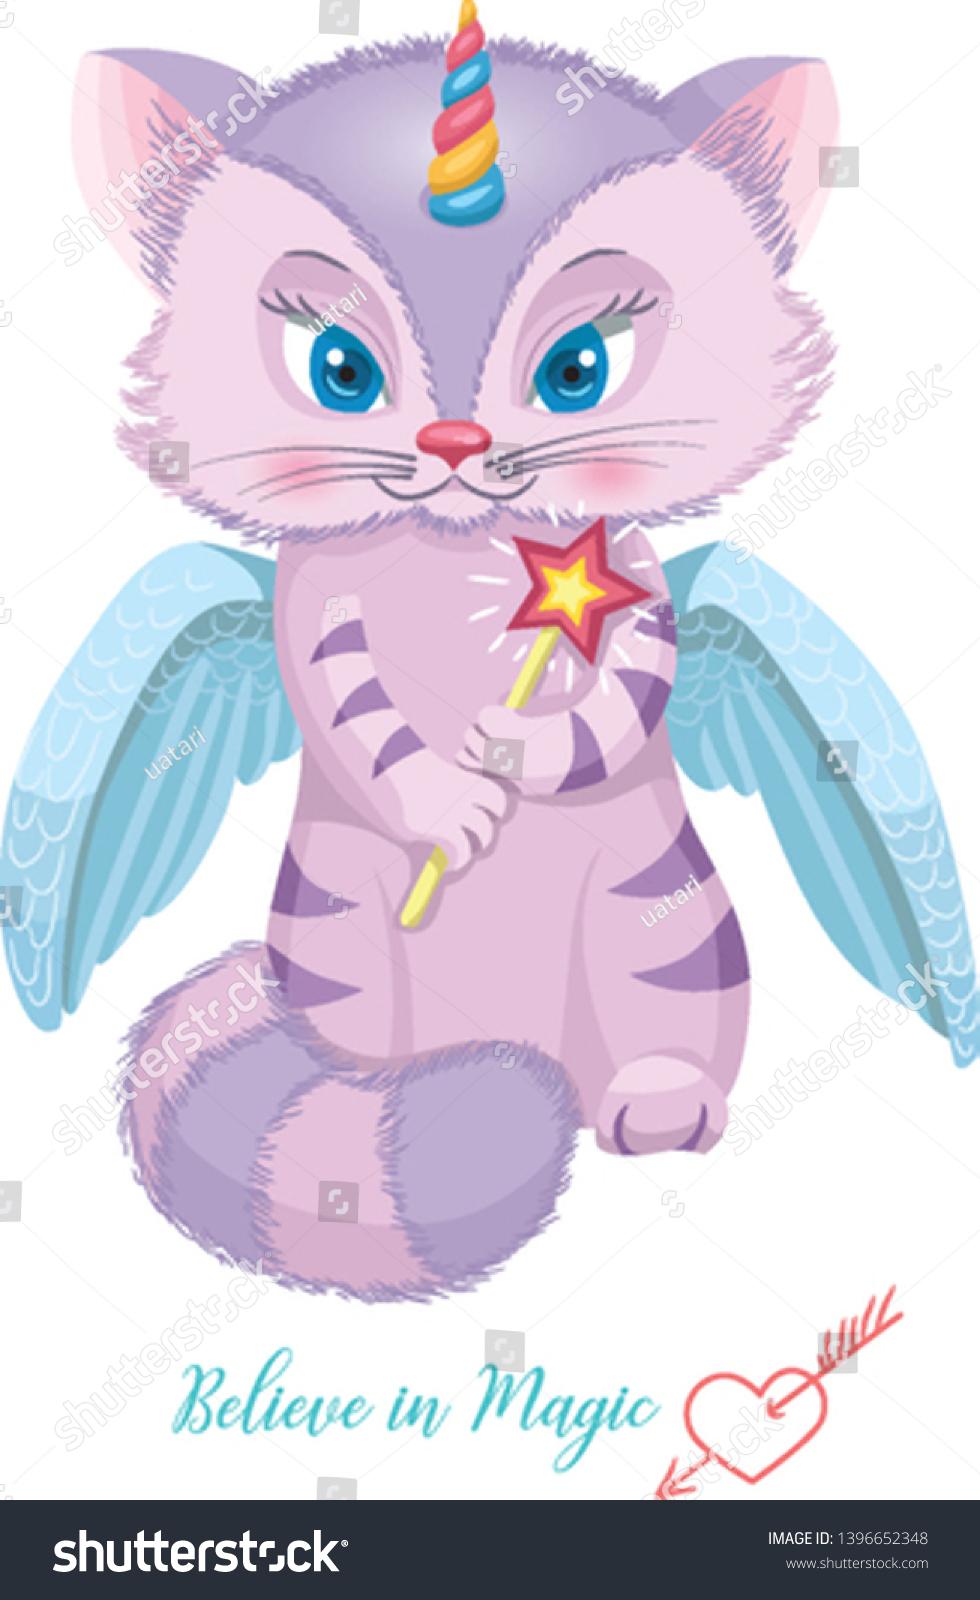 Childrens Wallpaper Cute Cat Unicorn Illustration Stock Vector Royalty Free 1396652348